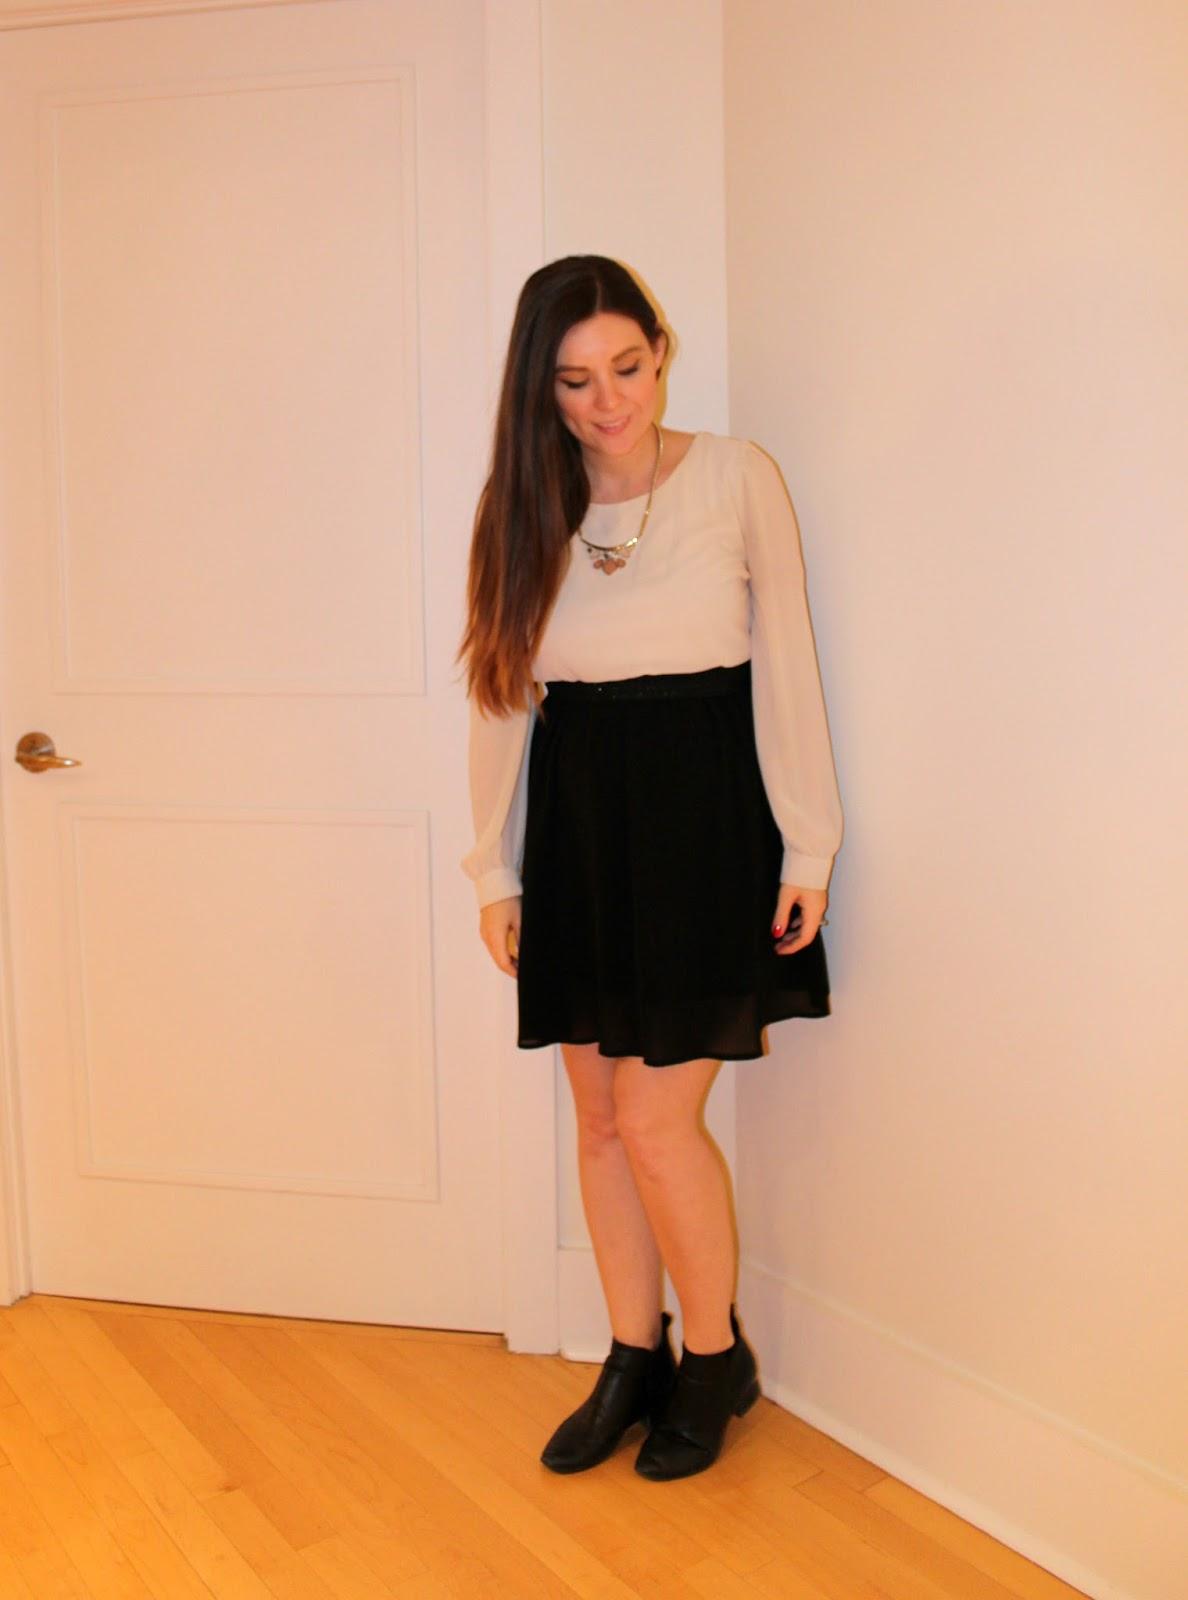 Black and White H&M Chiffon Dress, Maternity, Business Casual